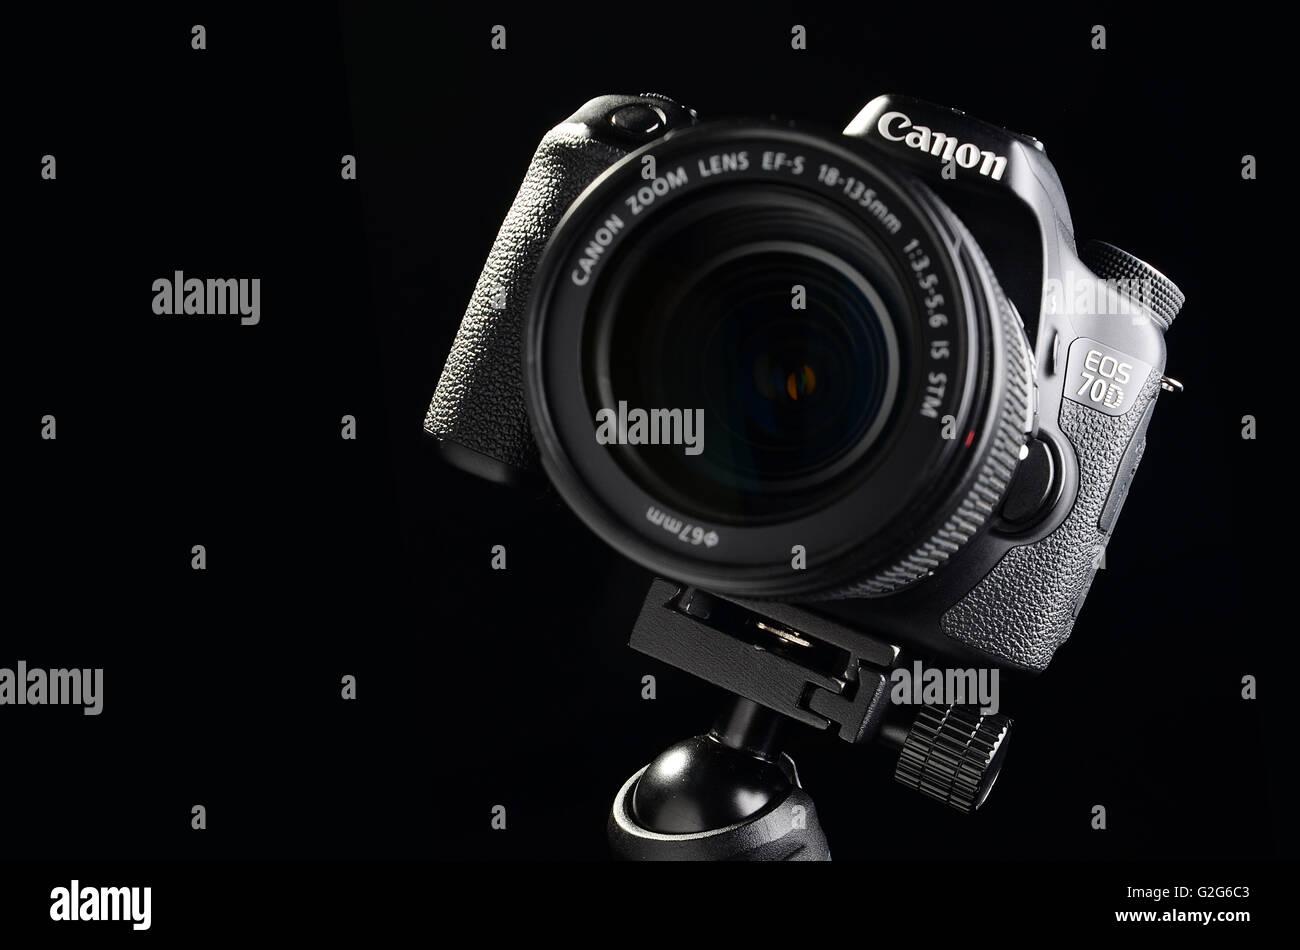 Camera Canon Digital SLR 70D - Stock Image